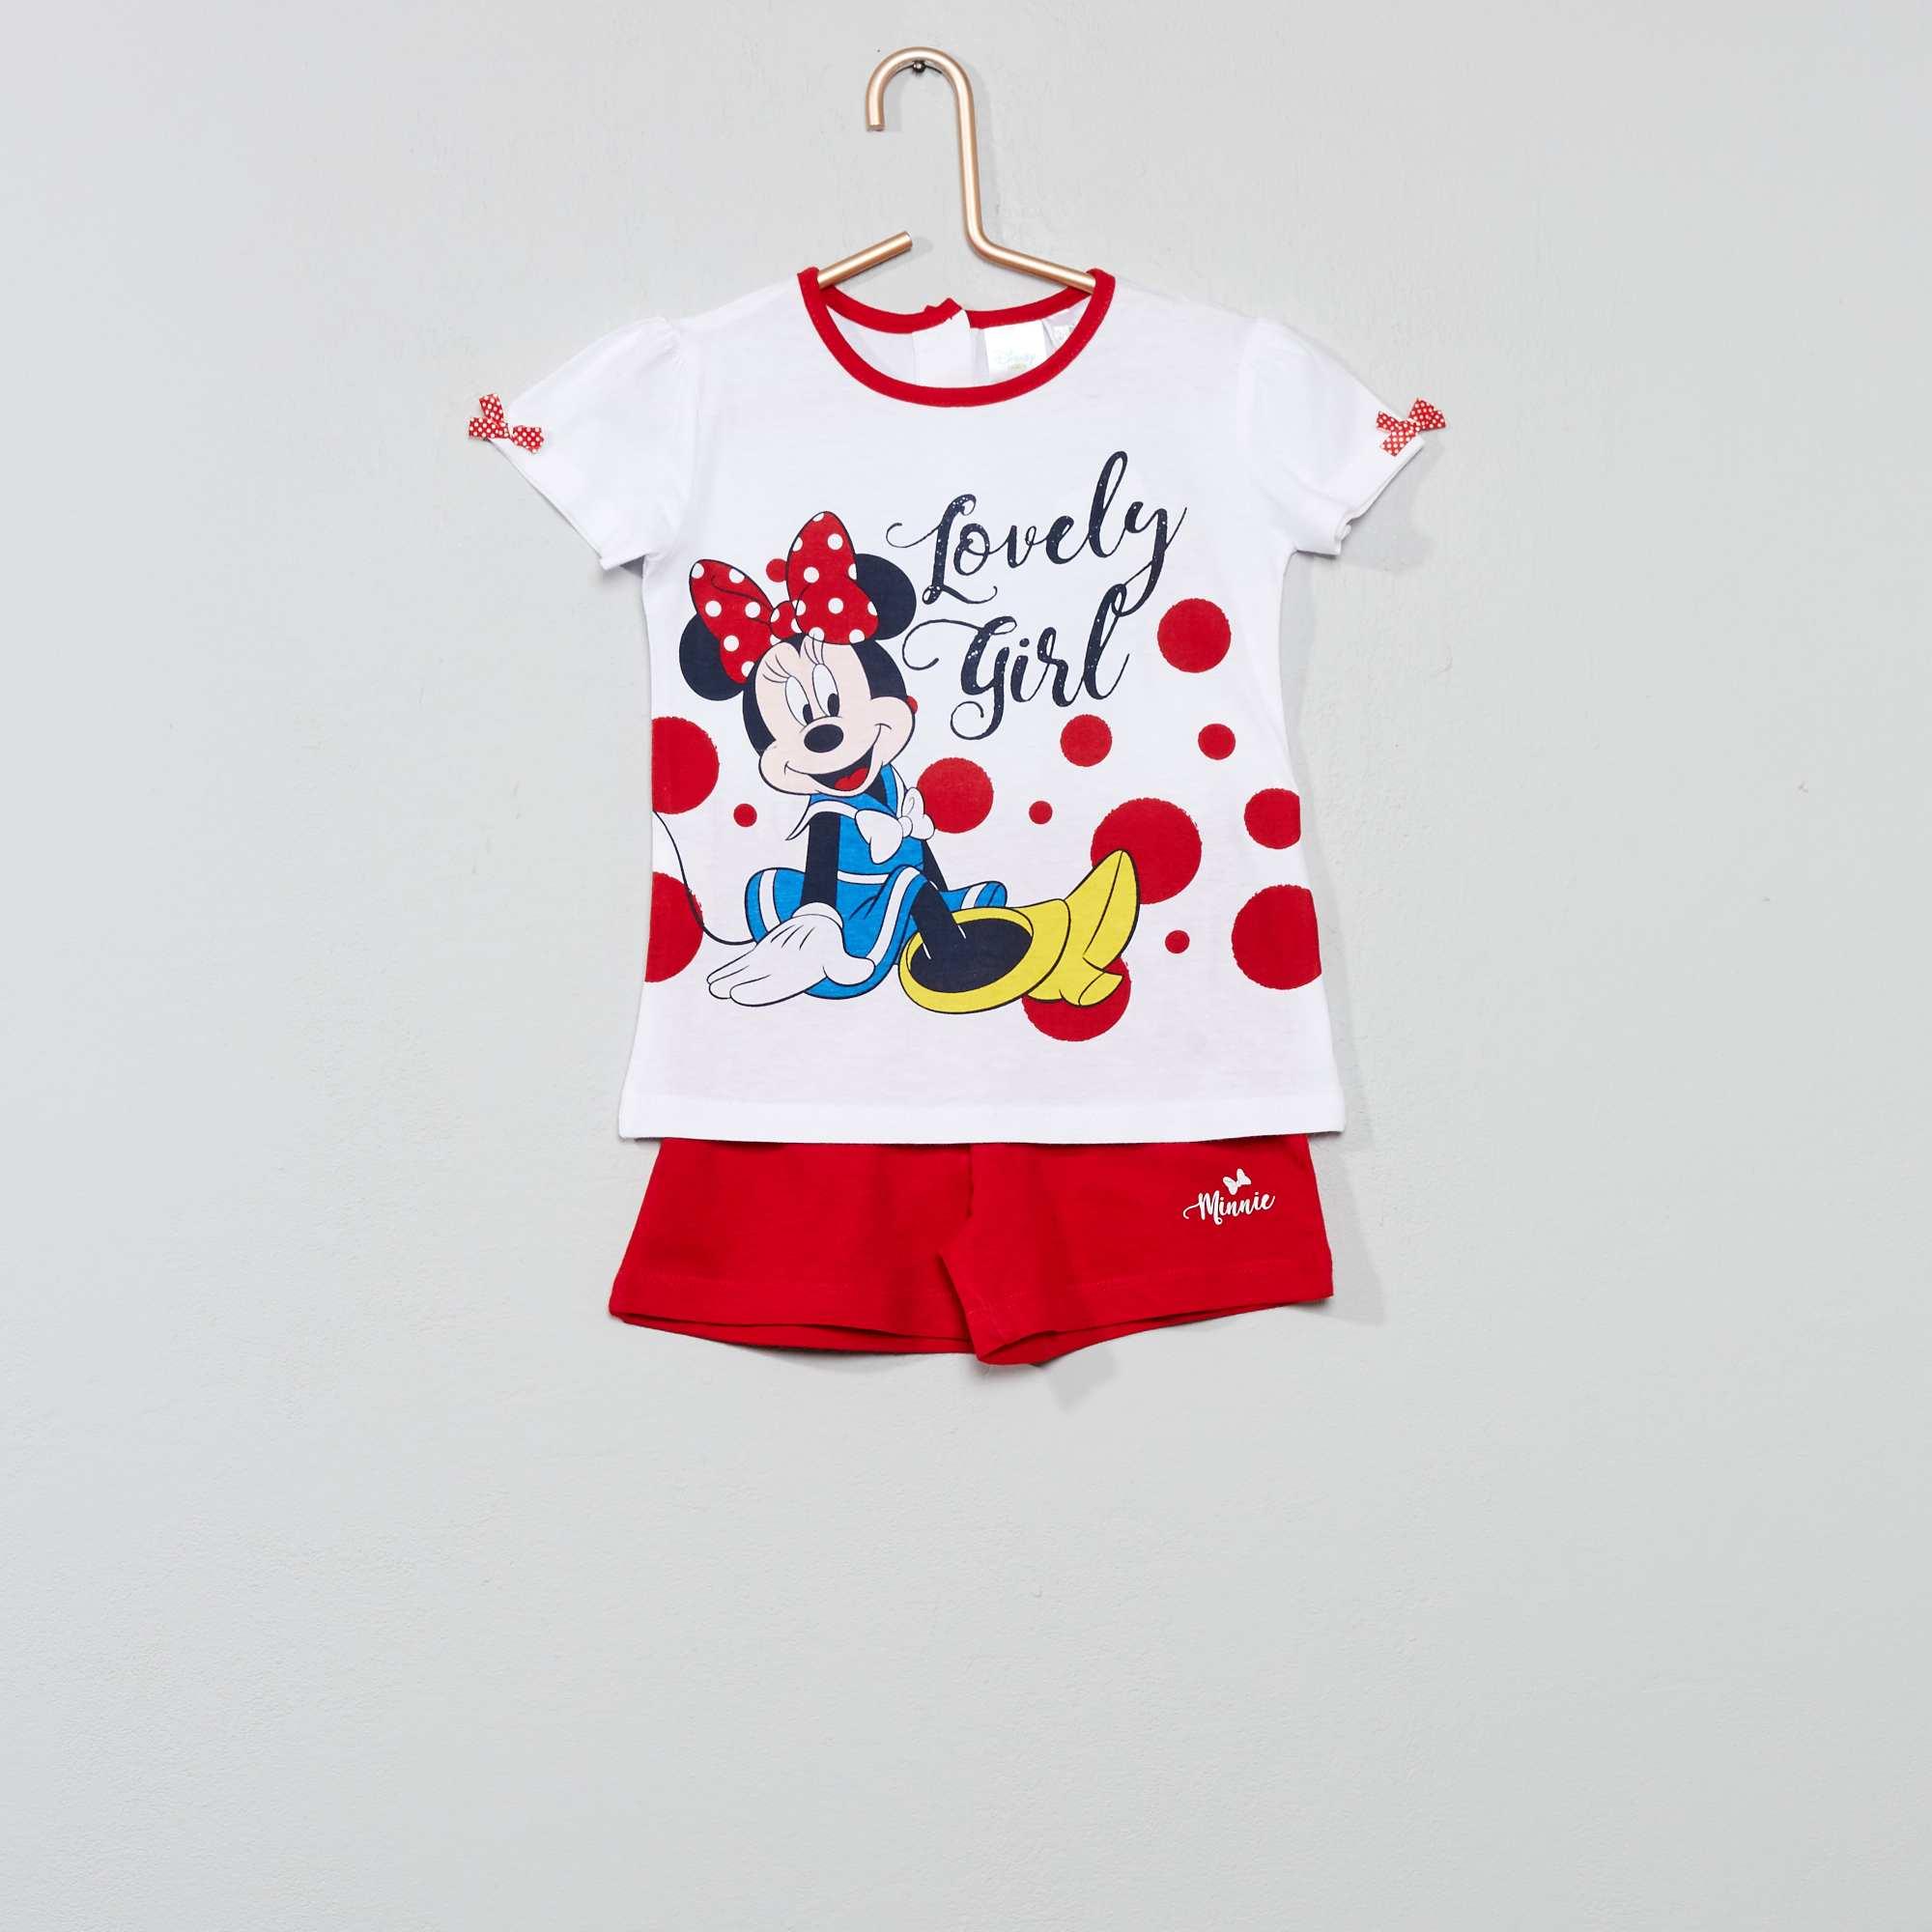 c01851c24 Conjunto de camiseta + pantalón corto  Minnie  rojo Bebé niña. Loading zoom